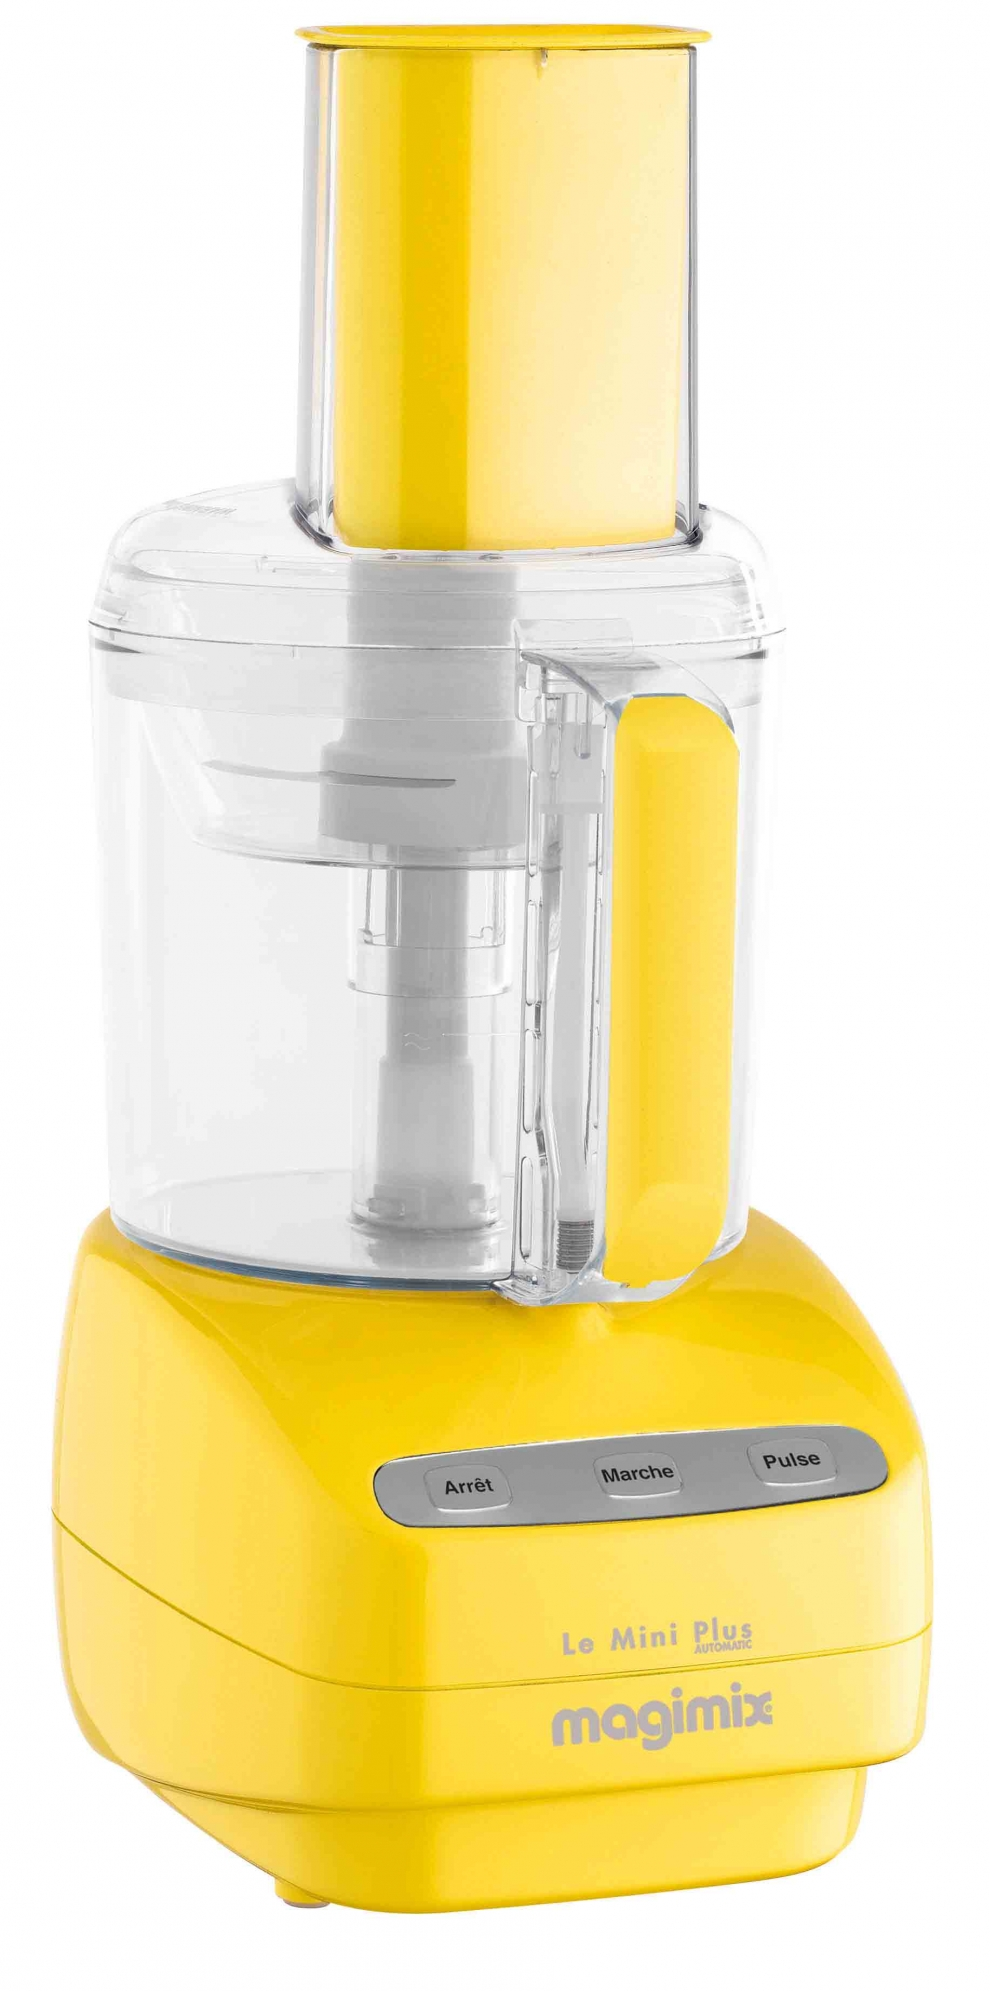 magimix robot magimix mini plus jaune citron avec. Black Bedroom Furniture Sets. Home Design Ideas